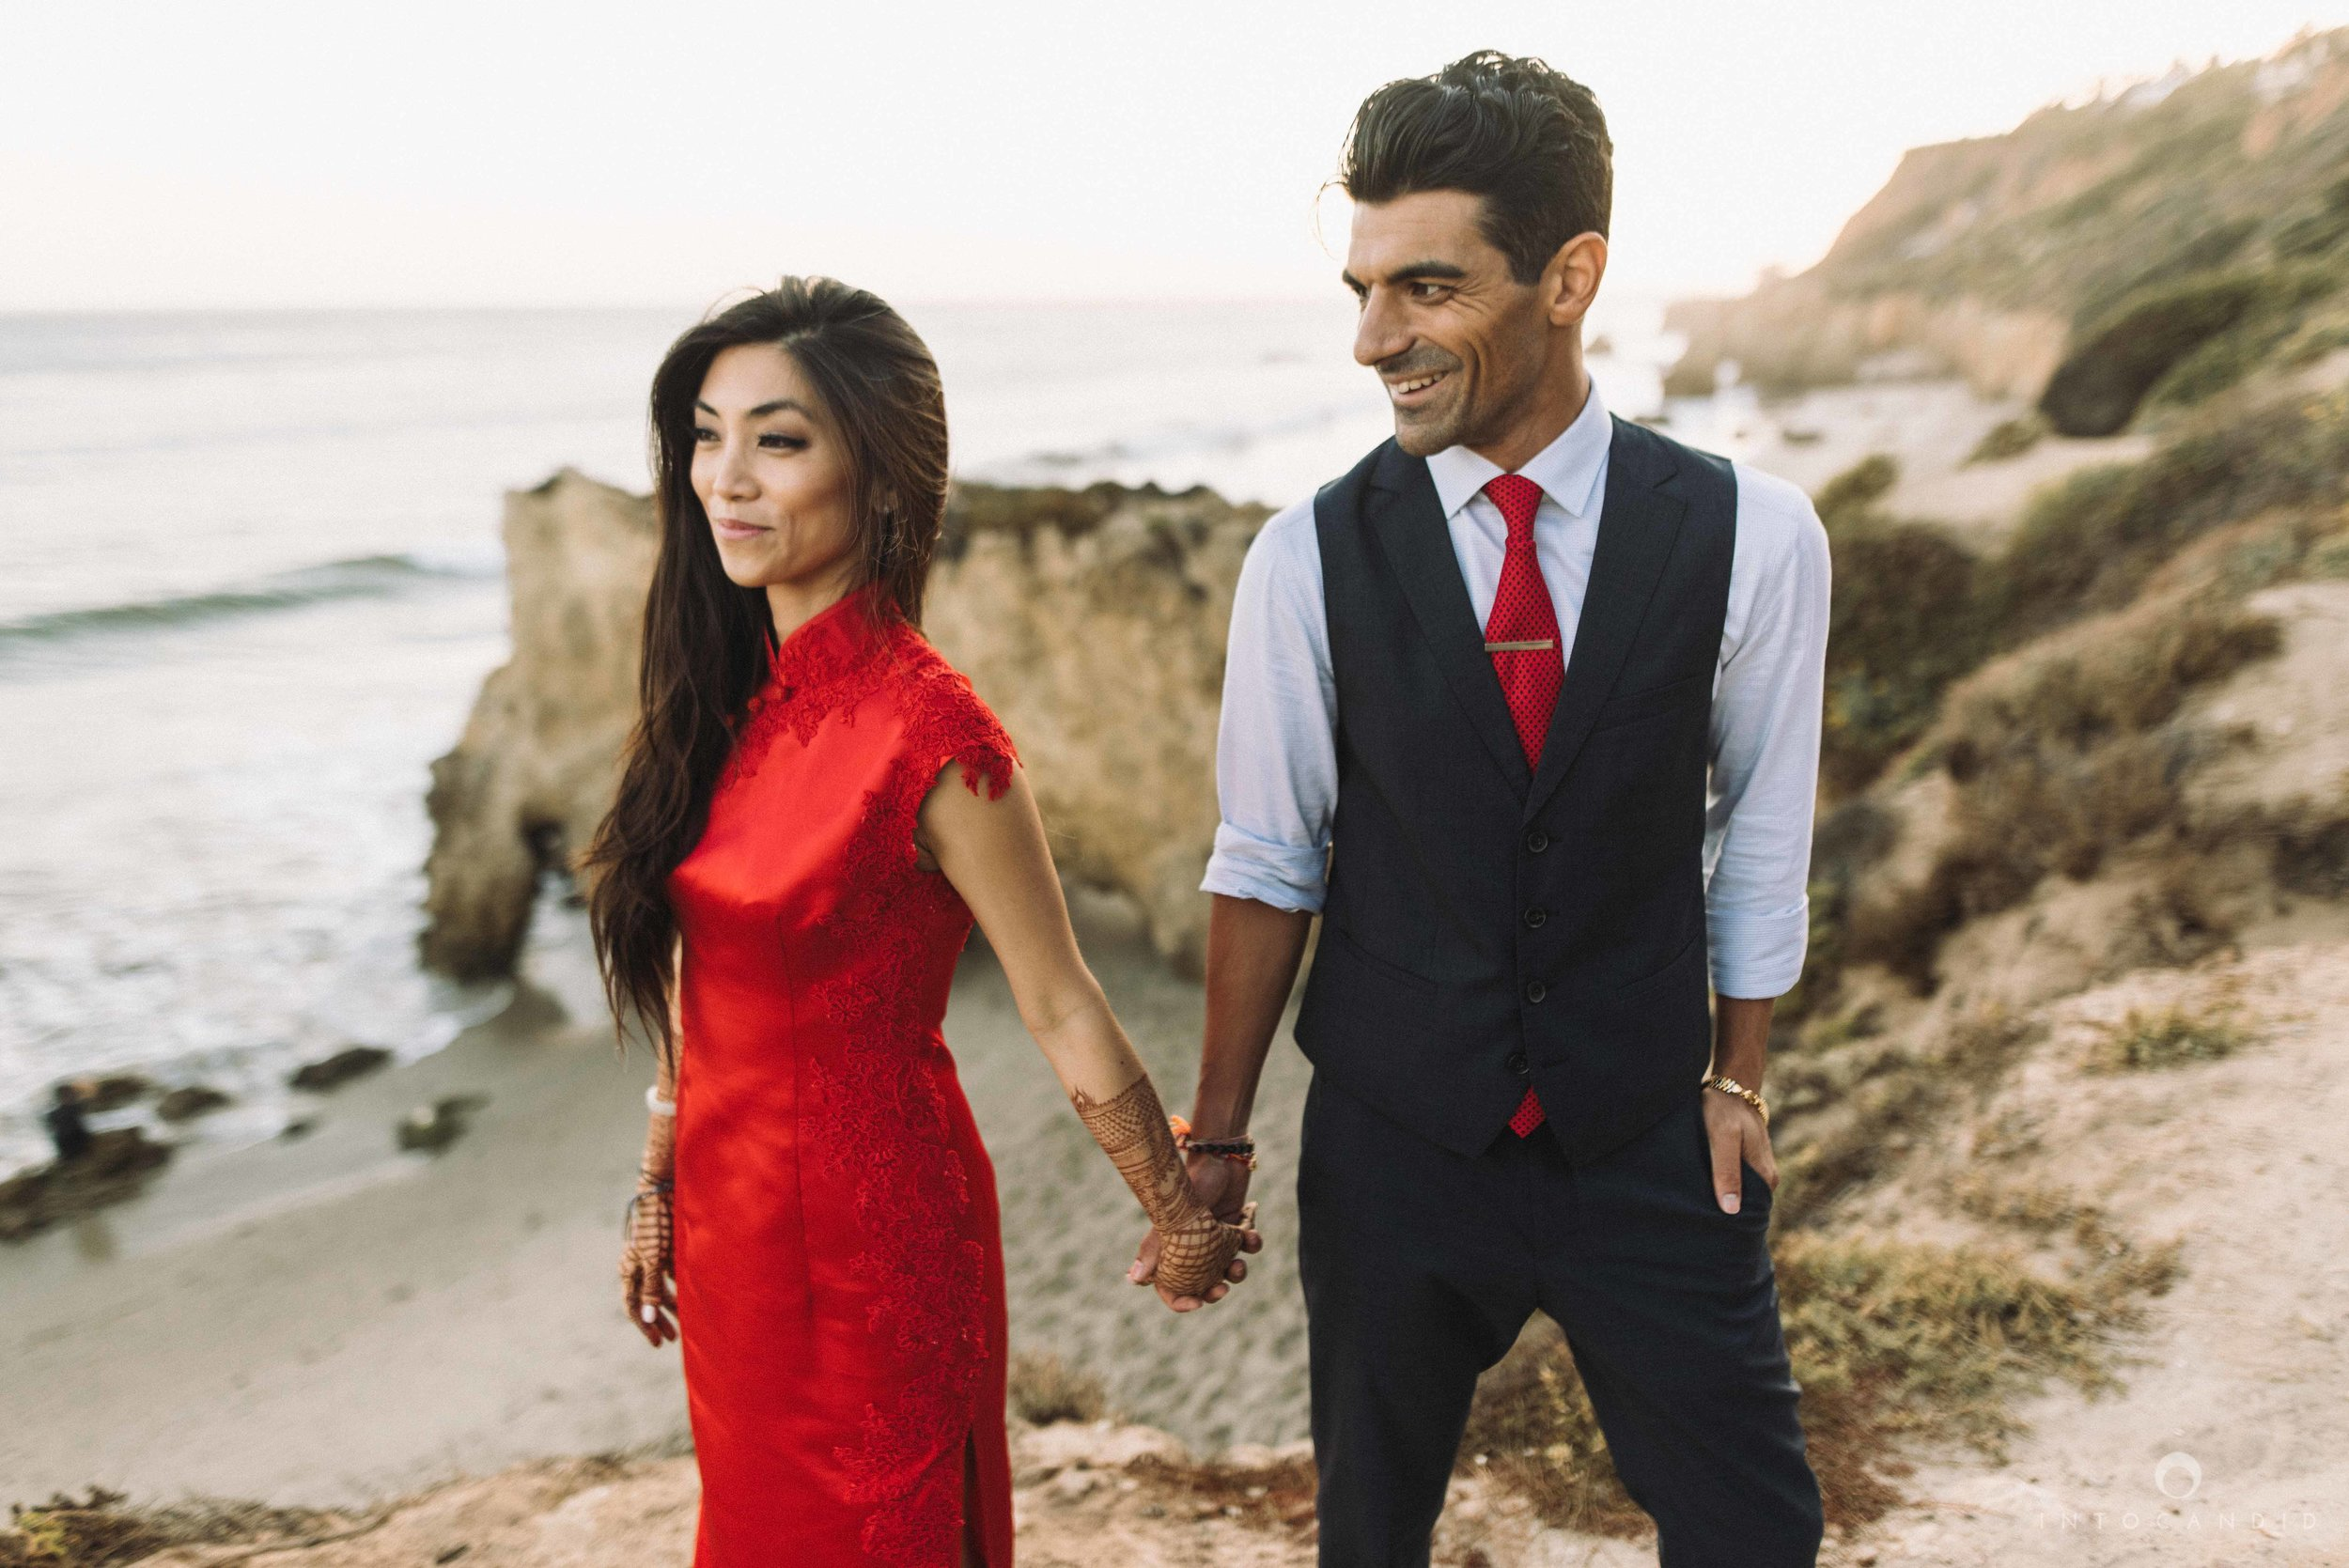 Malibu_California_Engagement_Photographer_AS_11.JPG